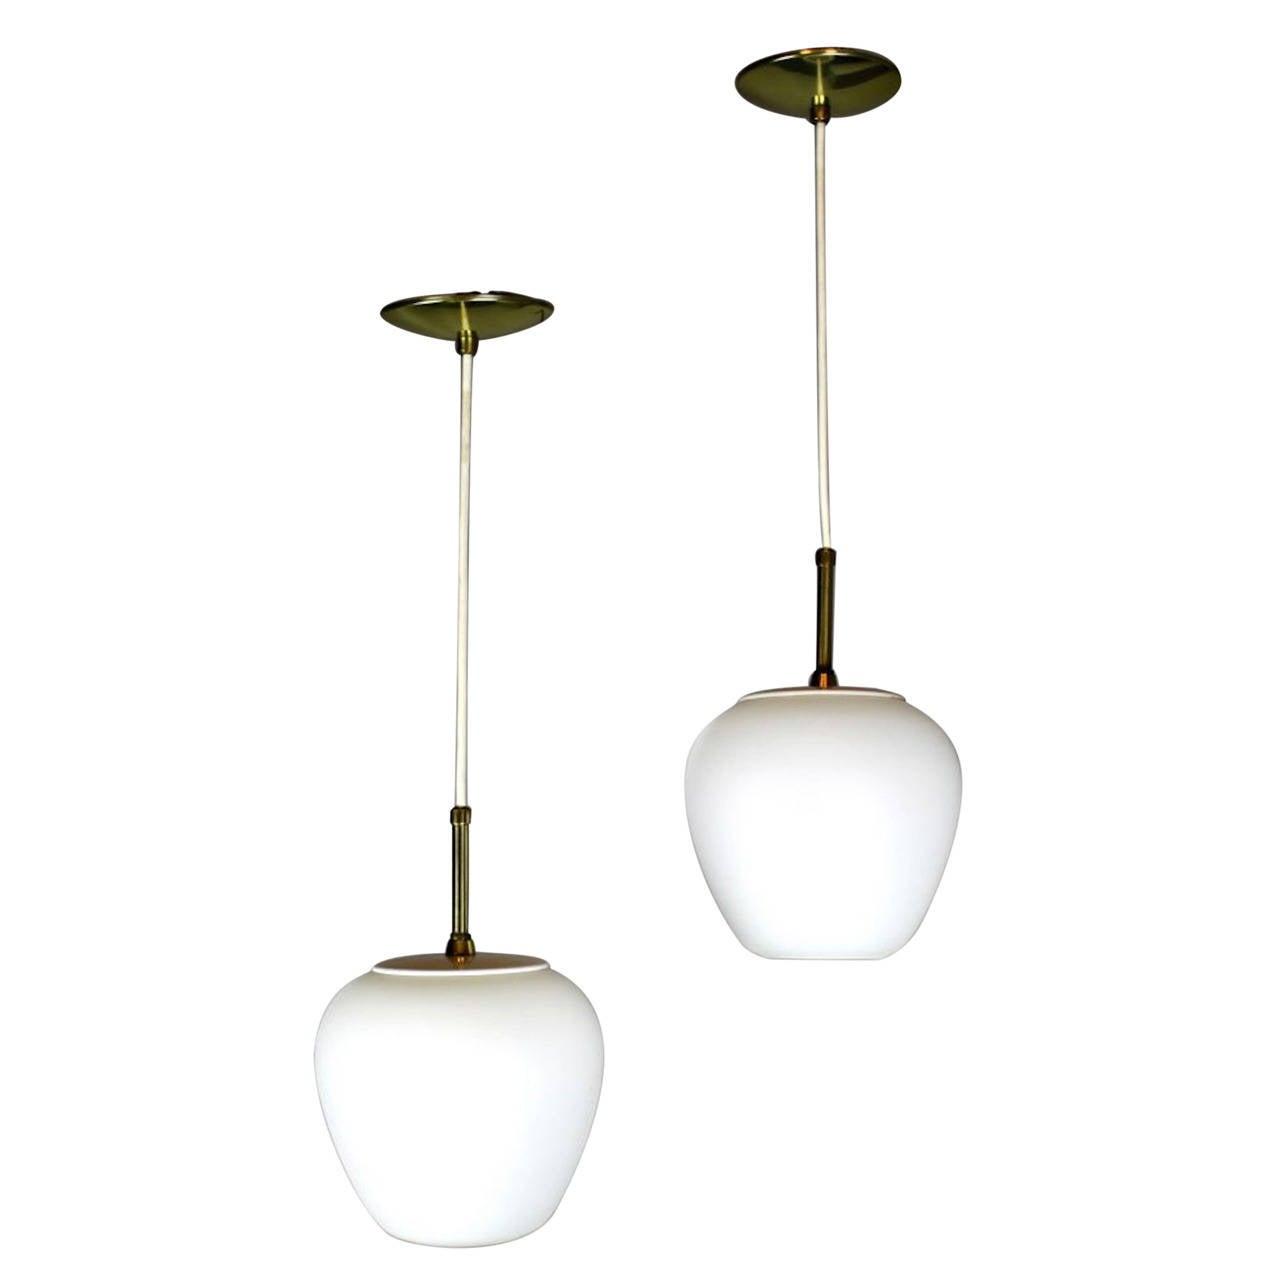 Mid century modern italian style pendant lights at 1stdibs for Mid century modern hanging lamp